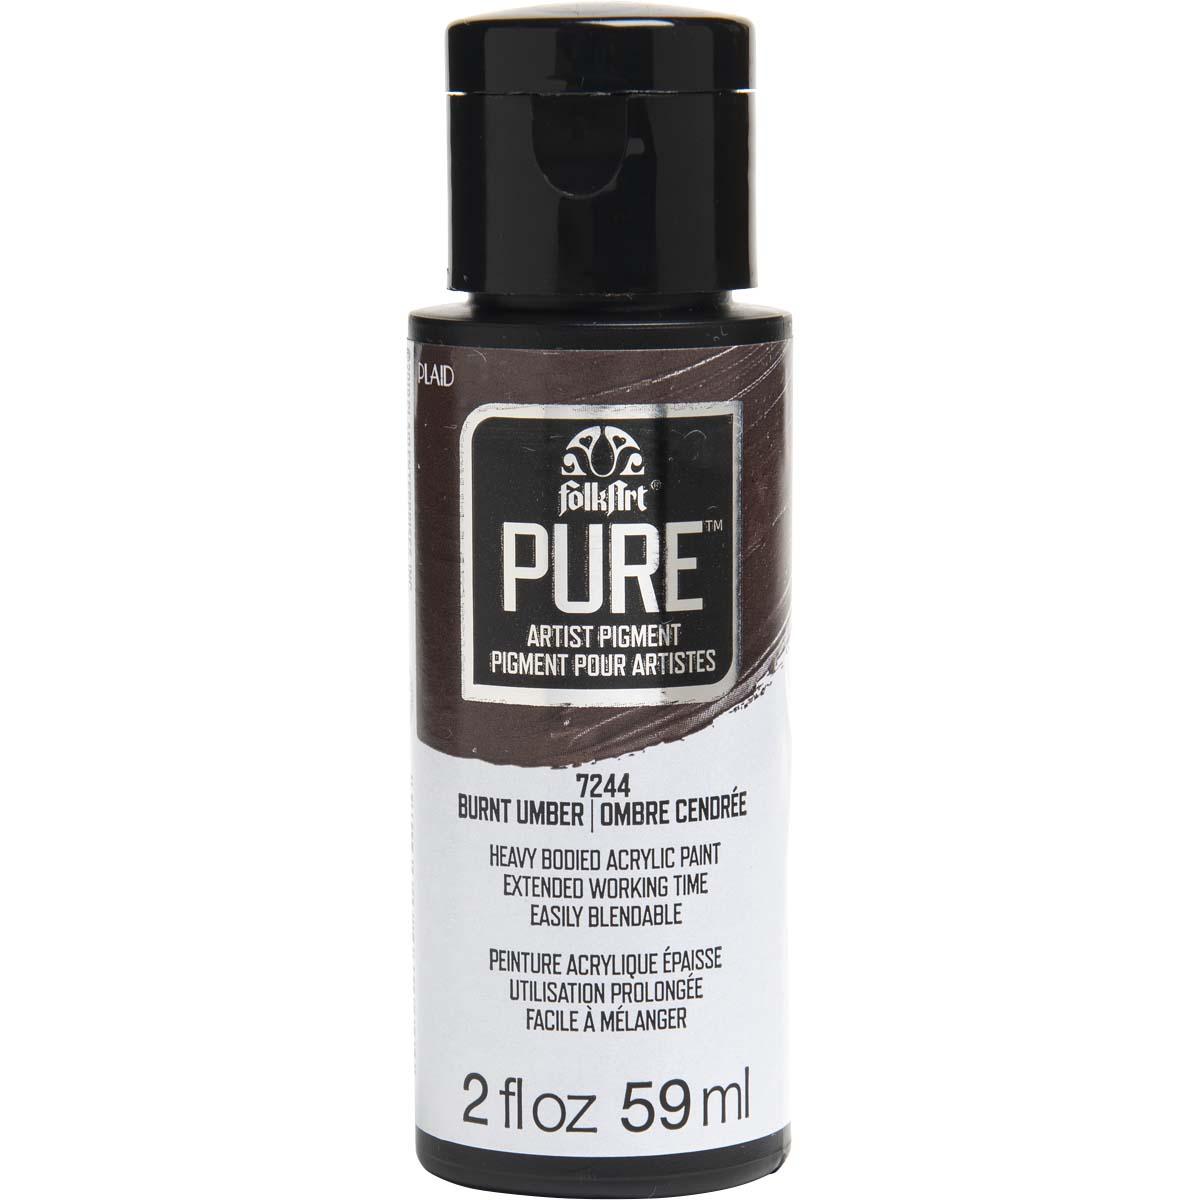 FolkArt ® Pure™ Artist Pigment - Burnt Umber, 2 oz. - 7244